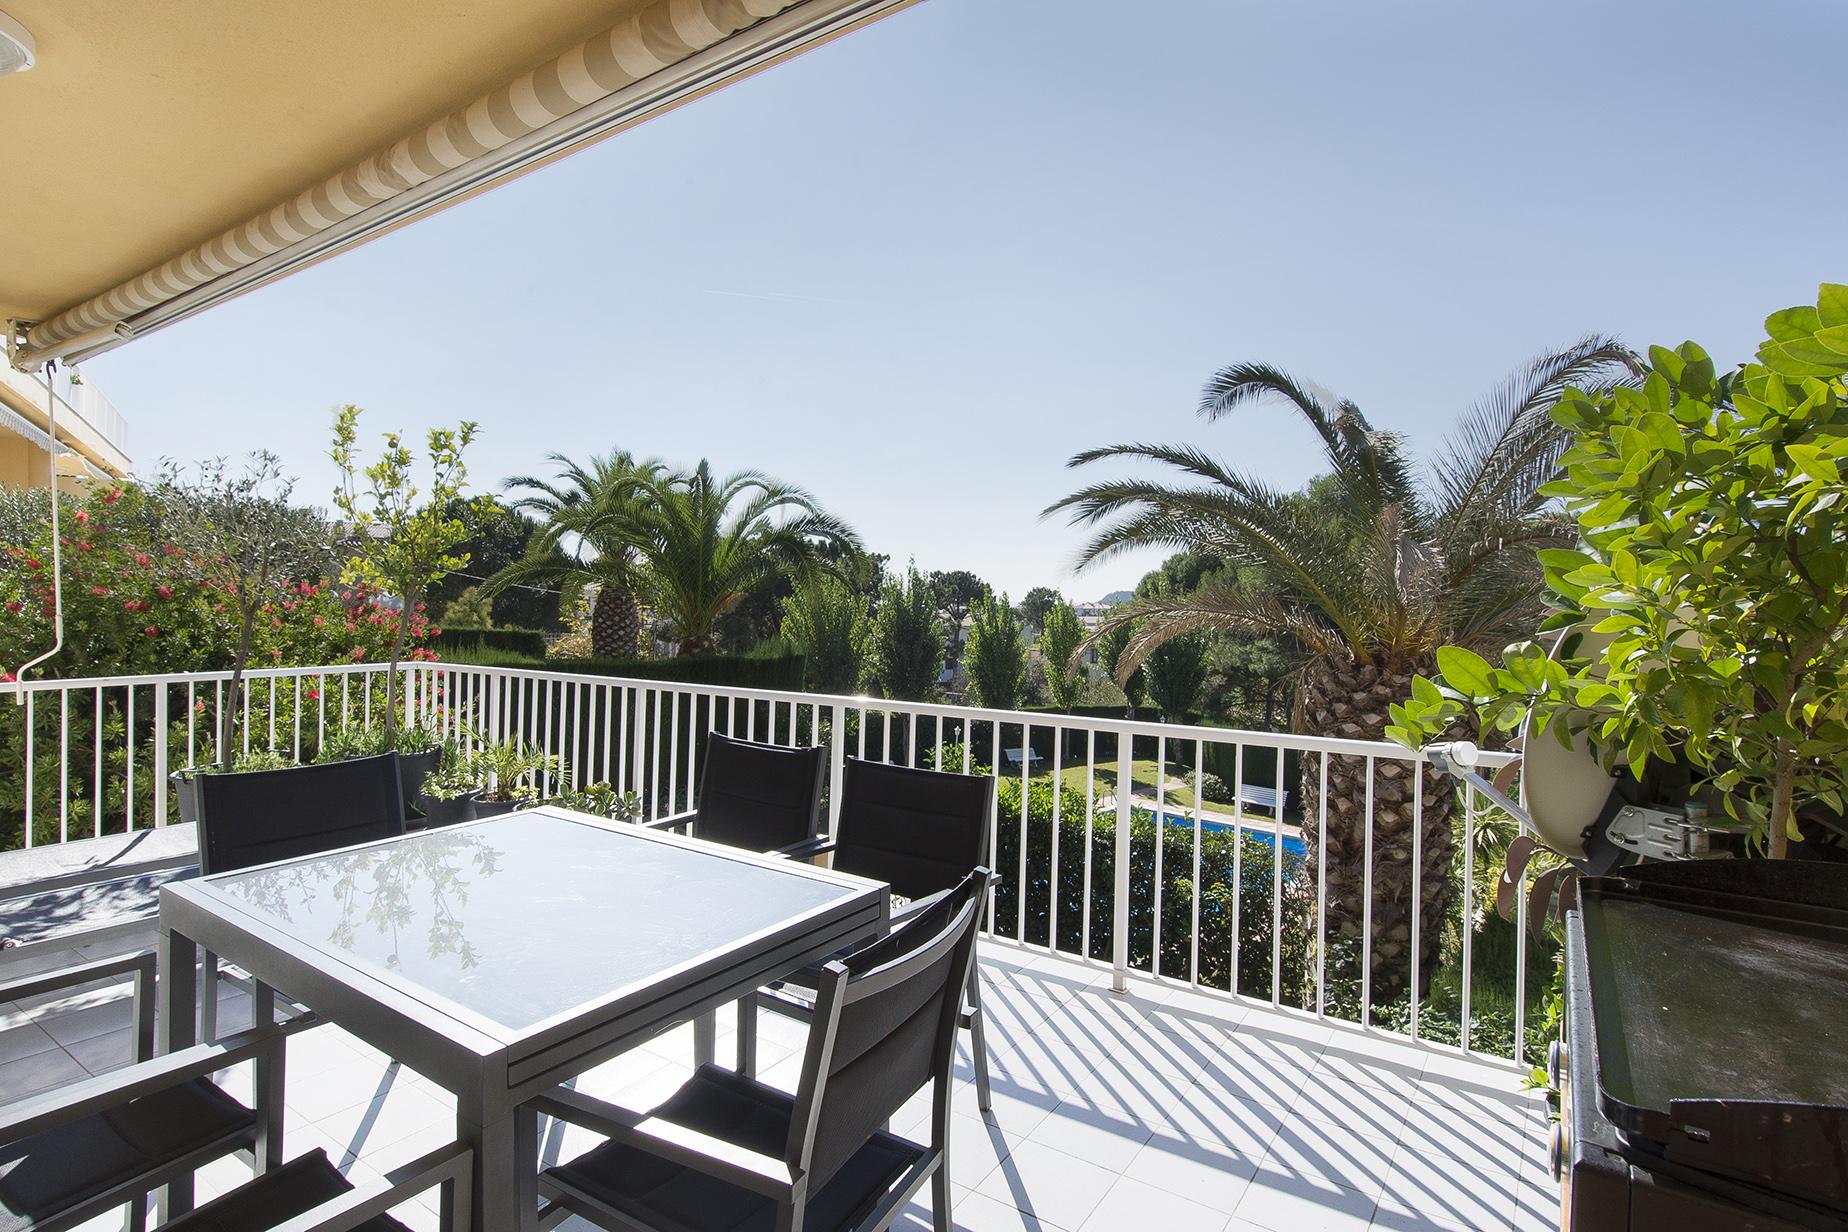 Apartment for Sale at Bright apartment near the beach of Sa Conca, S'Agaró S'Agaro, Costa Brava, 17248 Spain